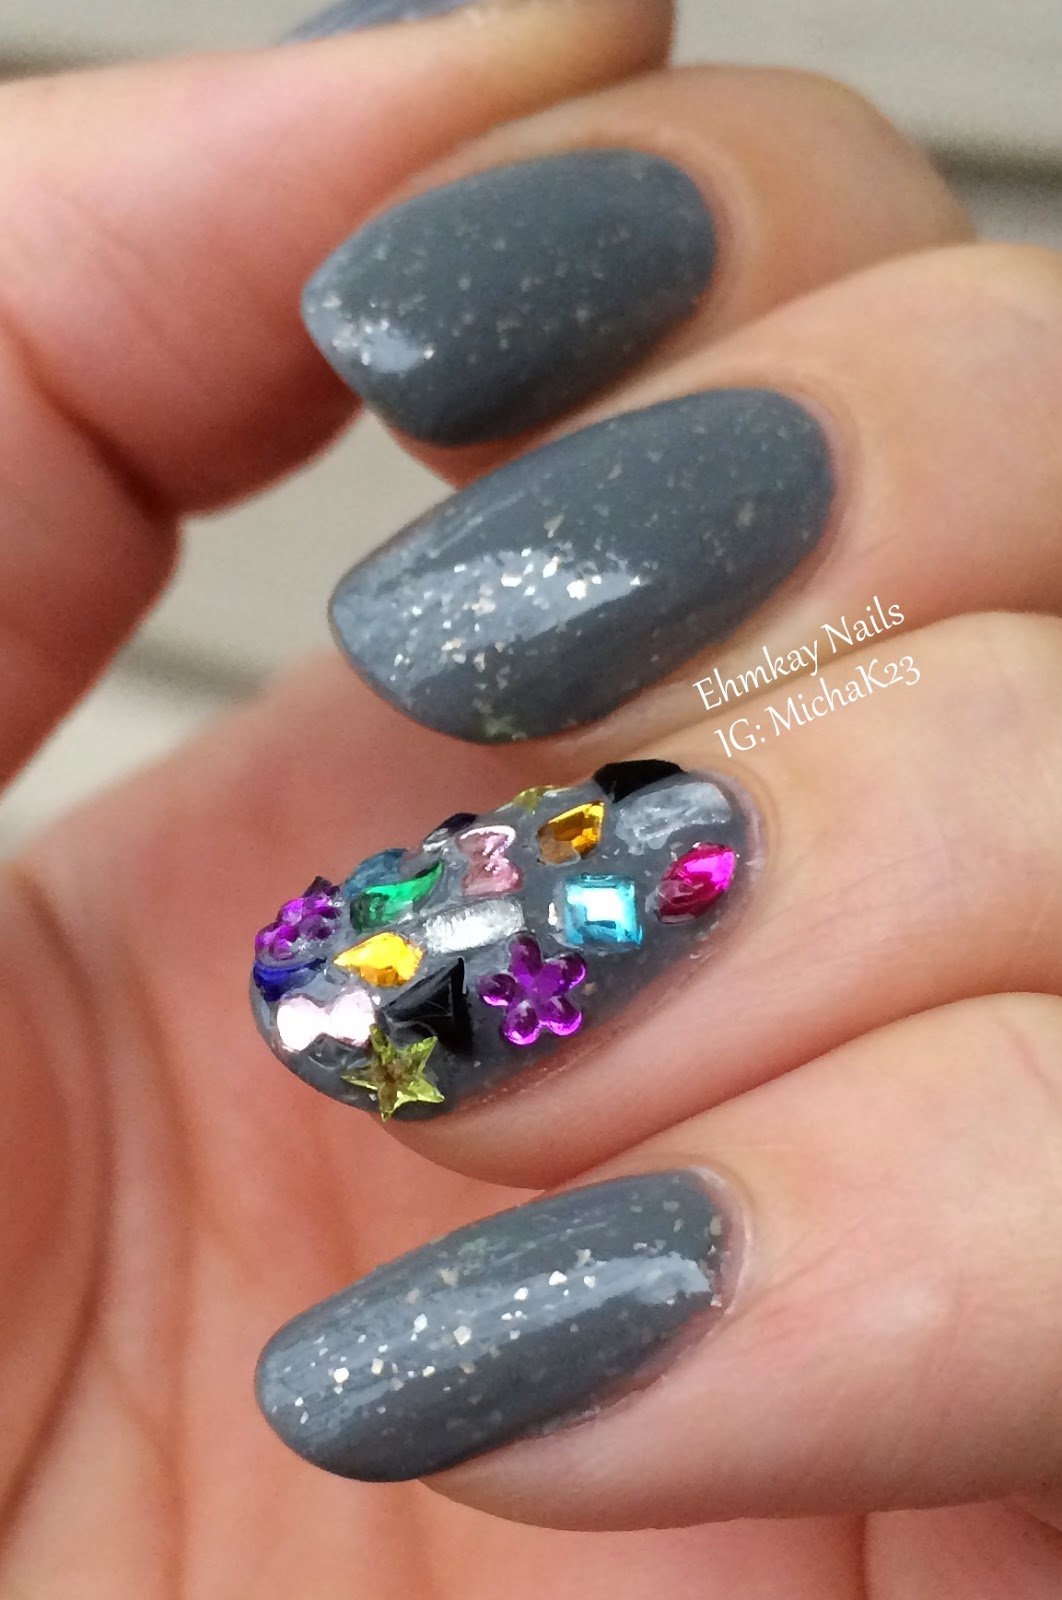 Ehmkay Nails: Playing With Born Pretty Nail Art Studs